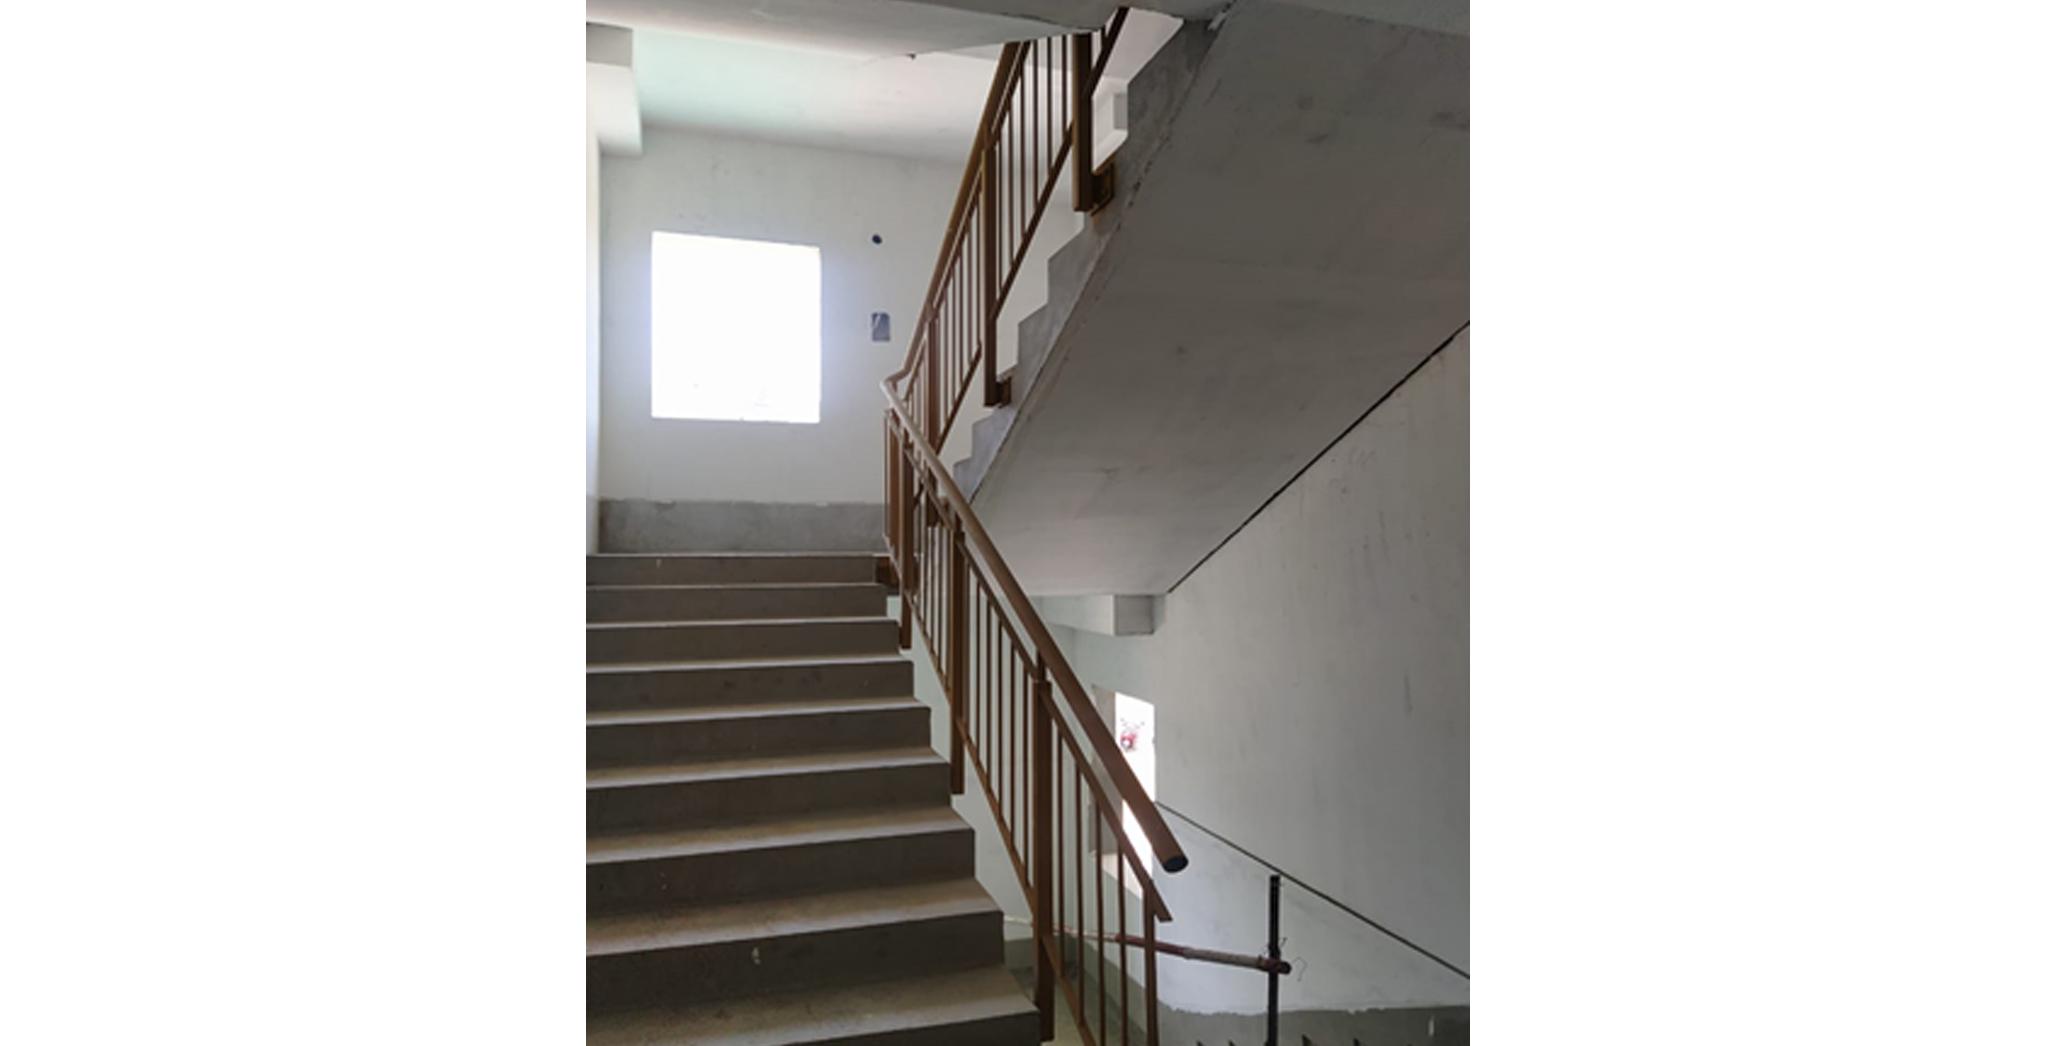 Aug 2021 - Staircase railing